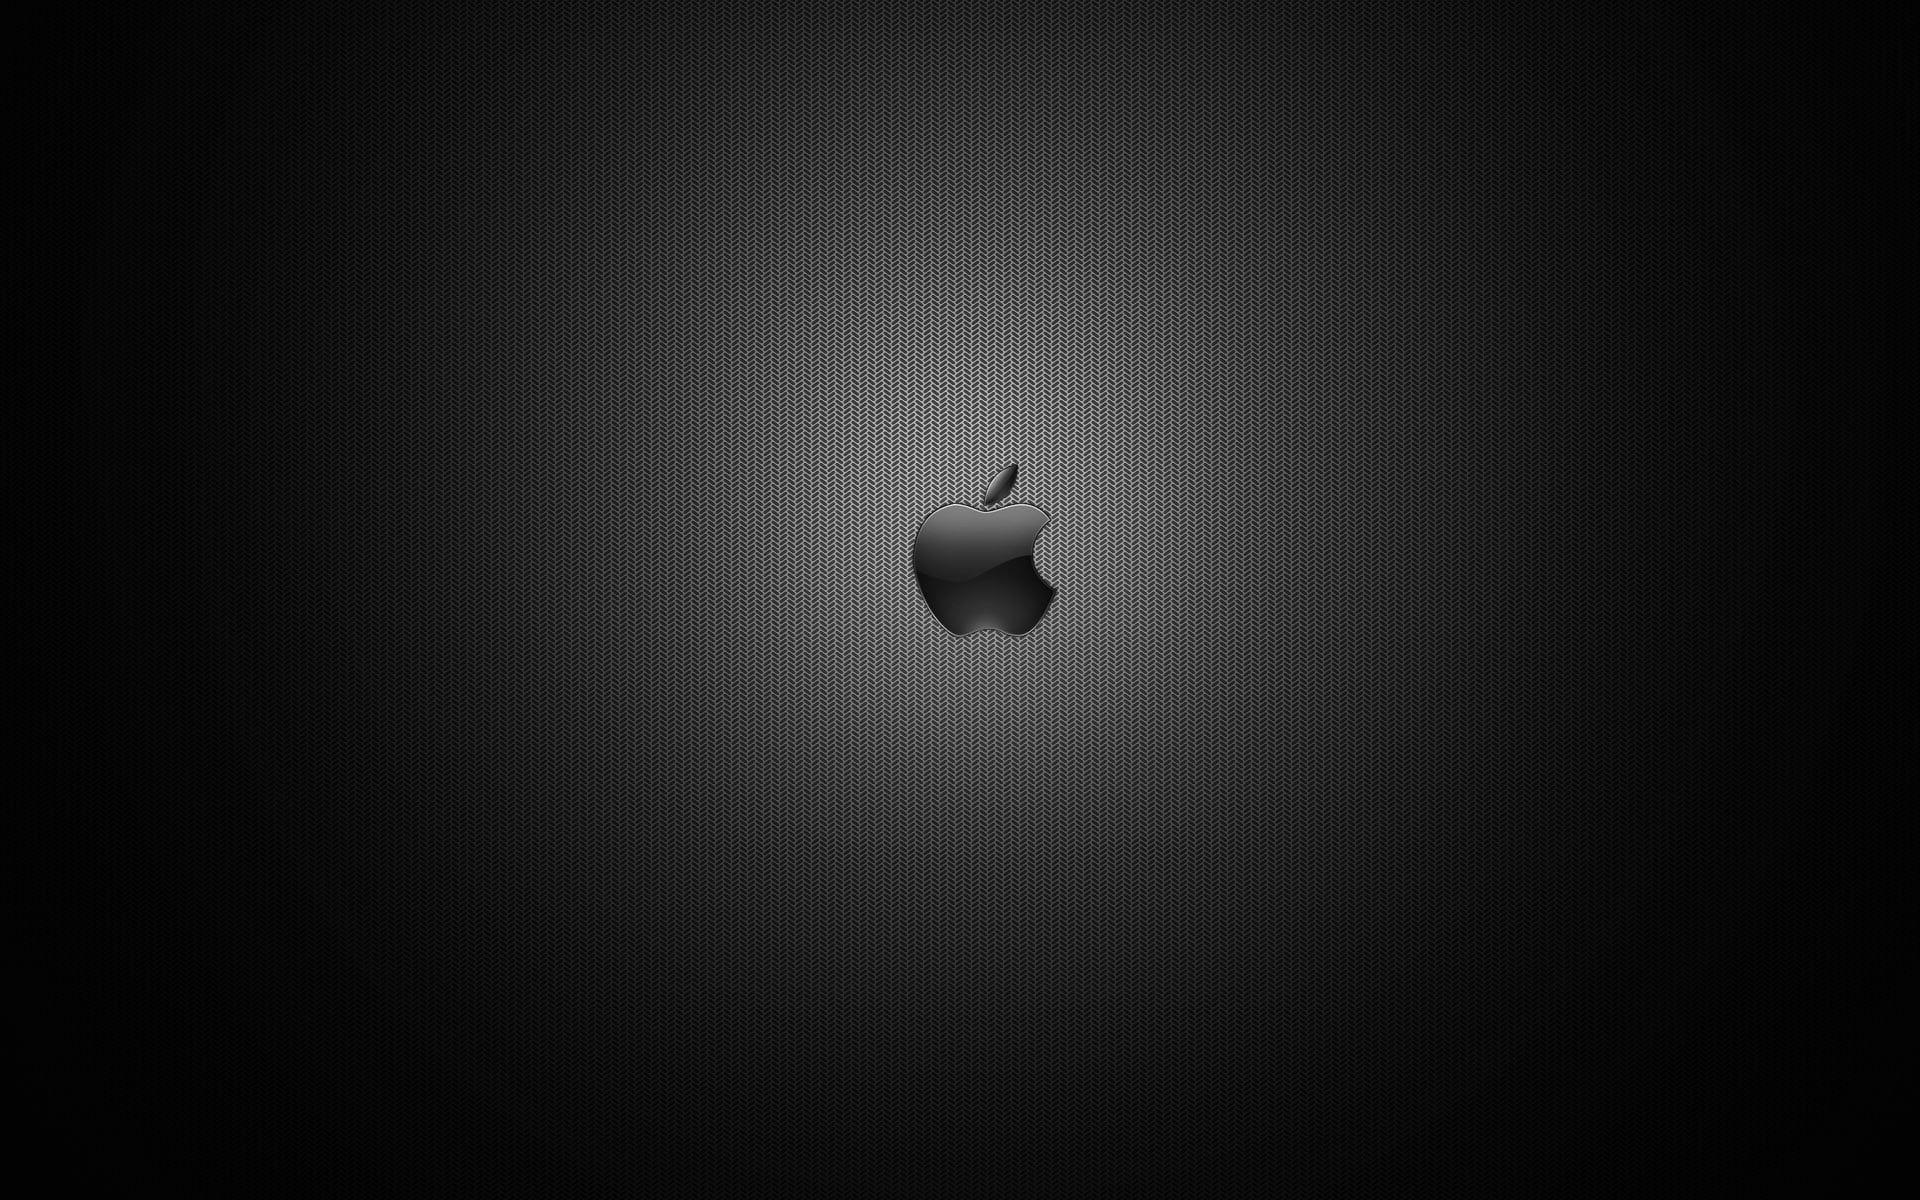 Apple Inc Digital Art Logo 1080p Wallpaper Hdwallpaper Desktop In 2020 Apple Logo Wallpaper Apple Wallpaper Logo Wallpaper Hd